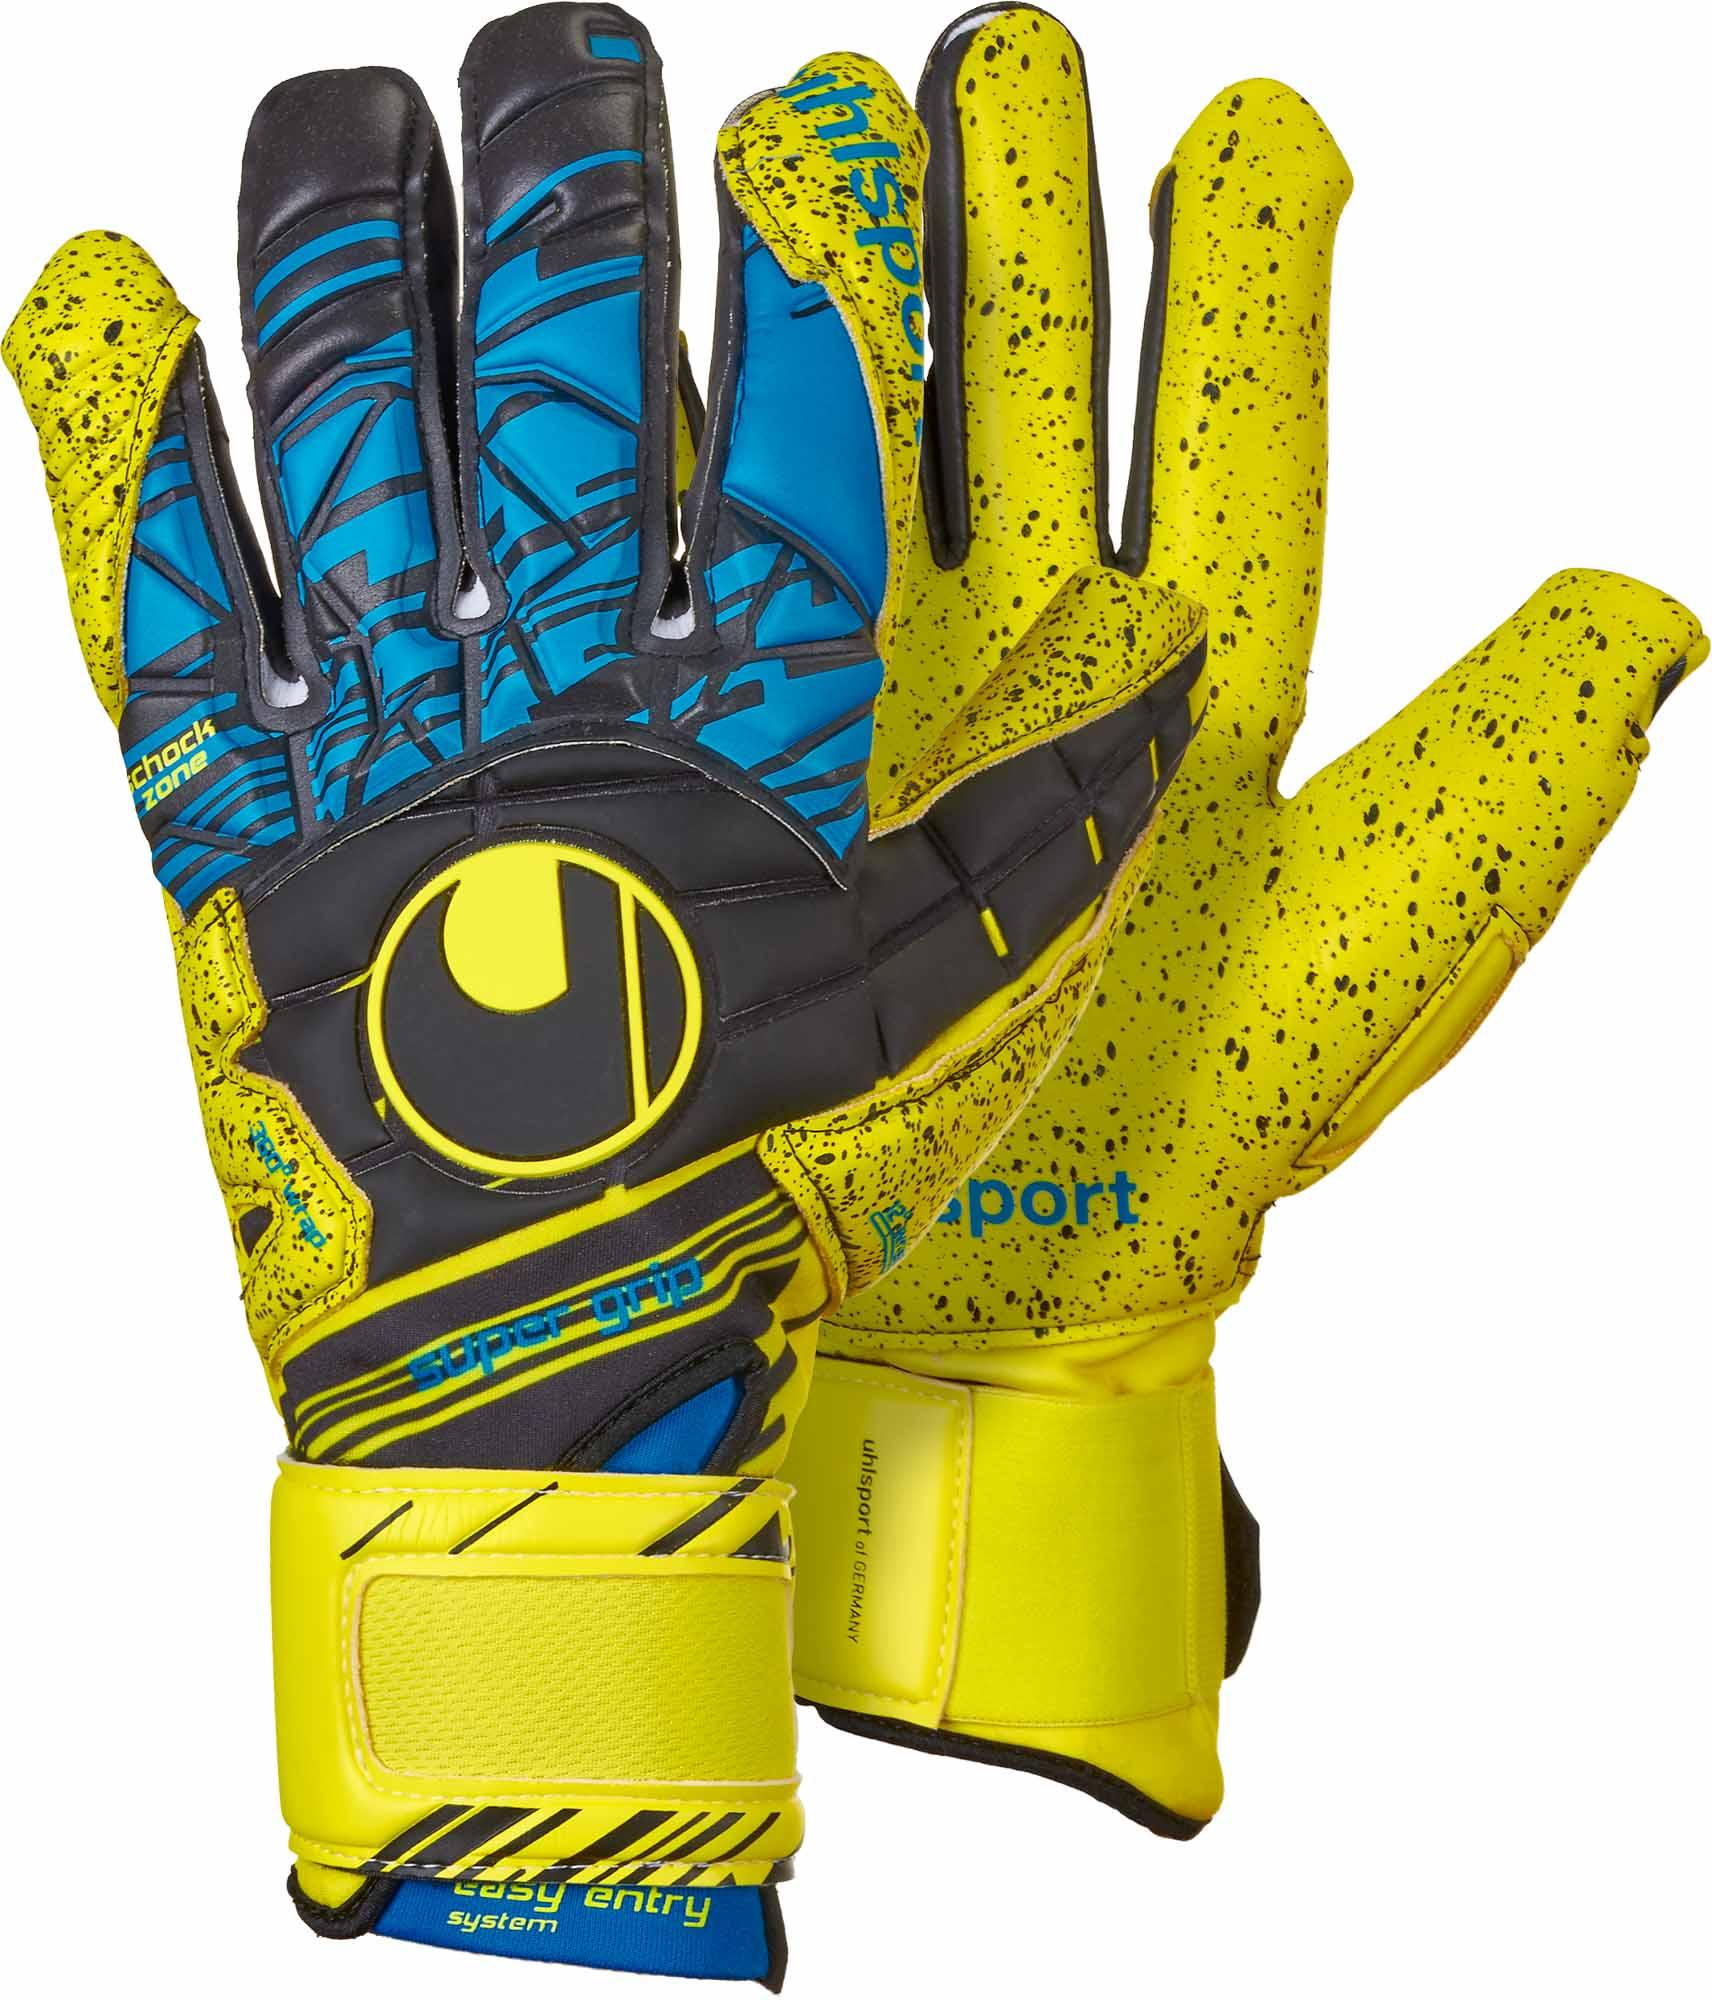 Uhlsport Eliminator Supergrip HN Goalkeeper Gloves - Fluo Yellow   Black 2cbb6d4c9